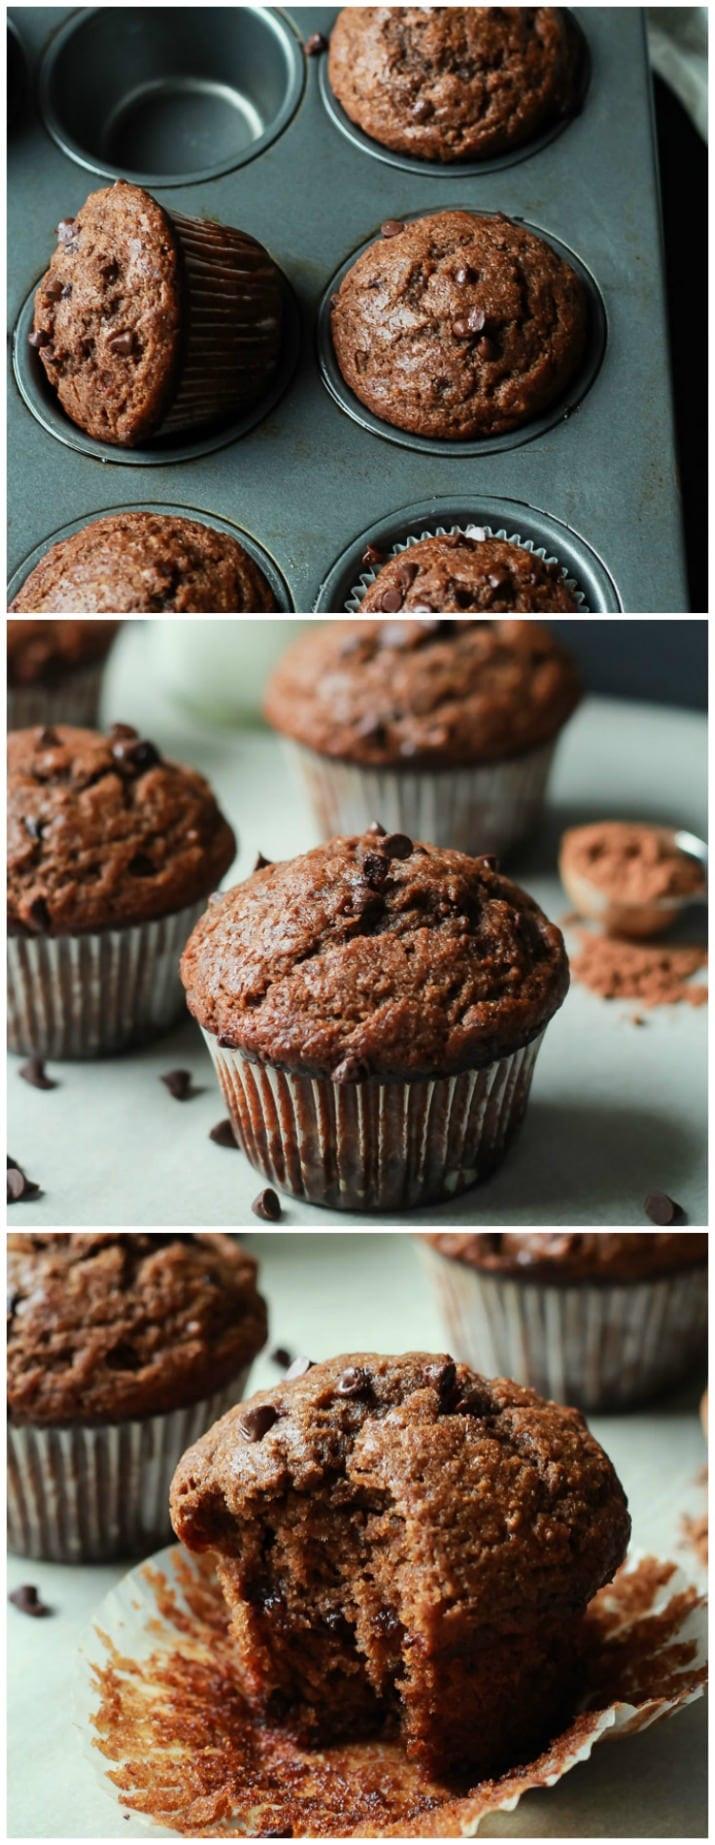 Healthy Chocolate Banana Muffins  Skinny Double Chocolate Banana Muffins